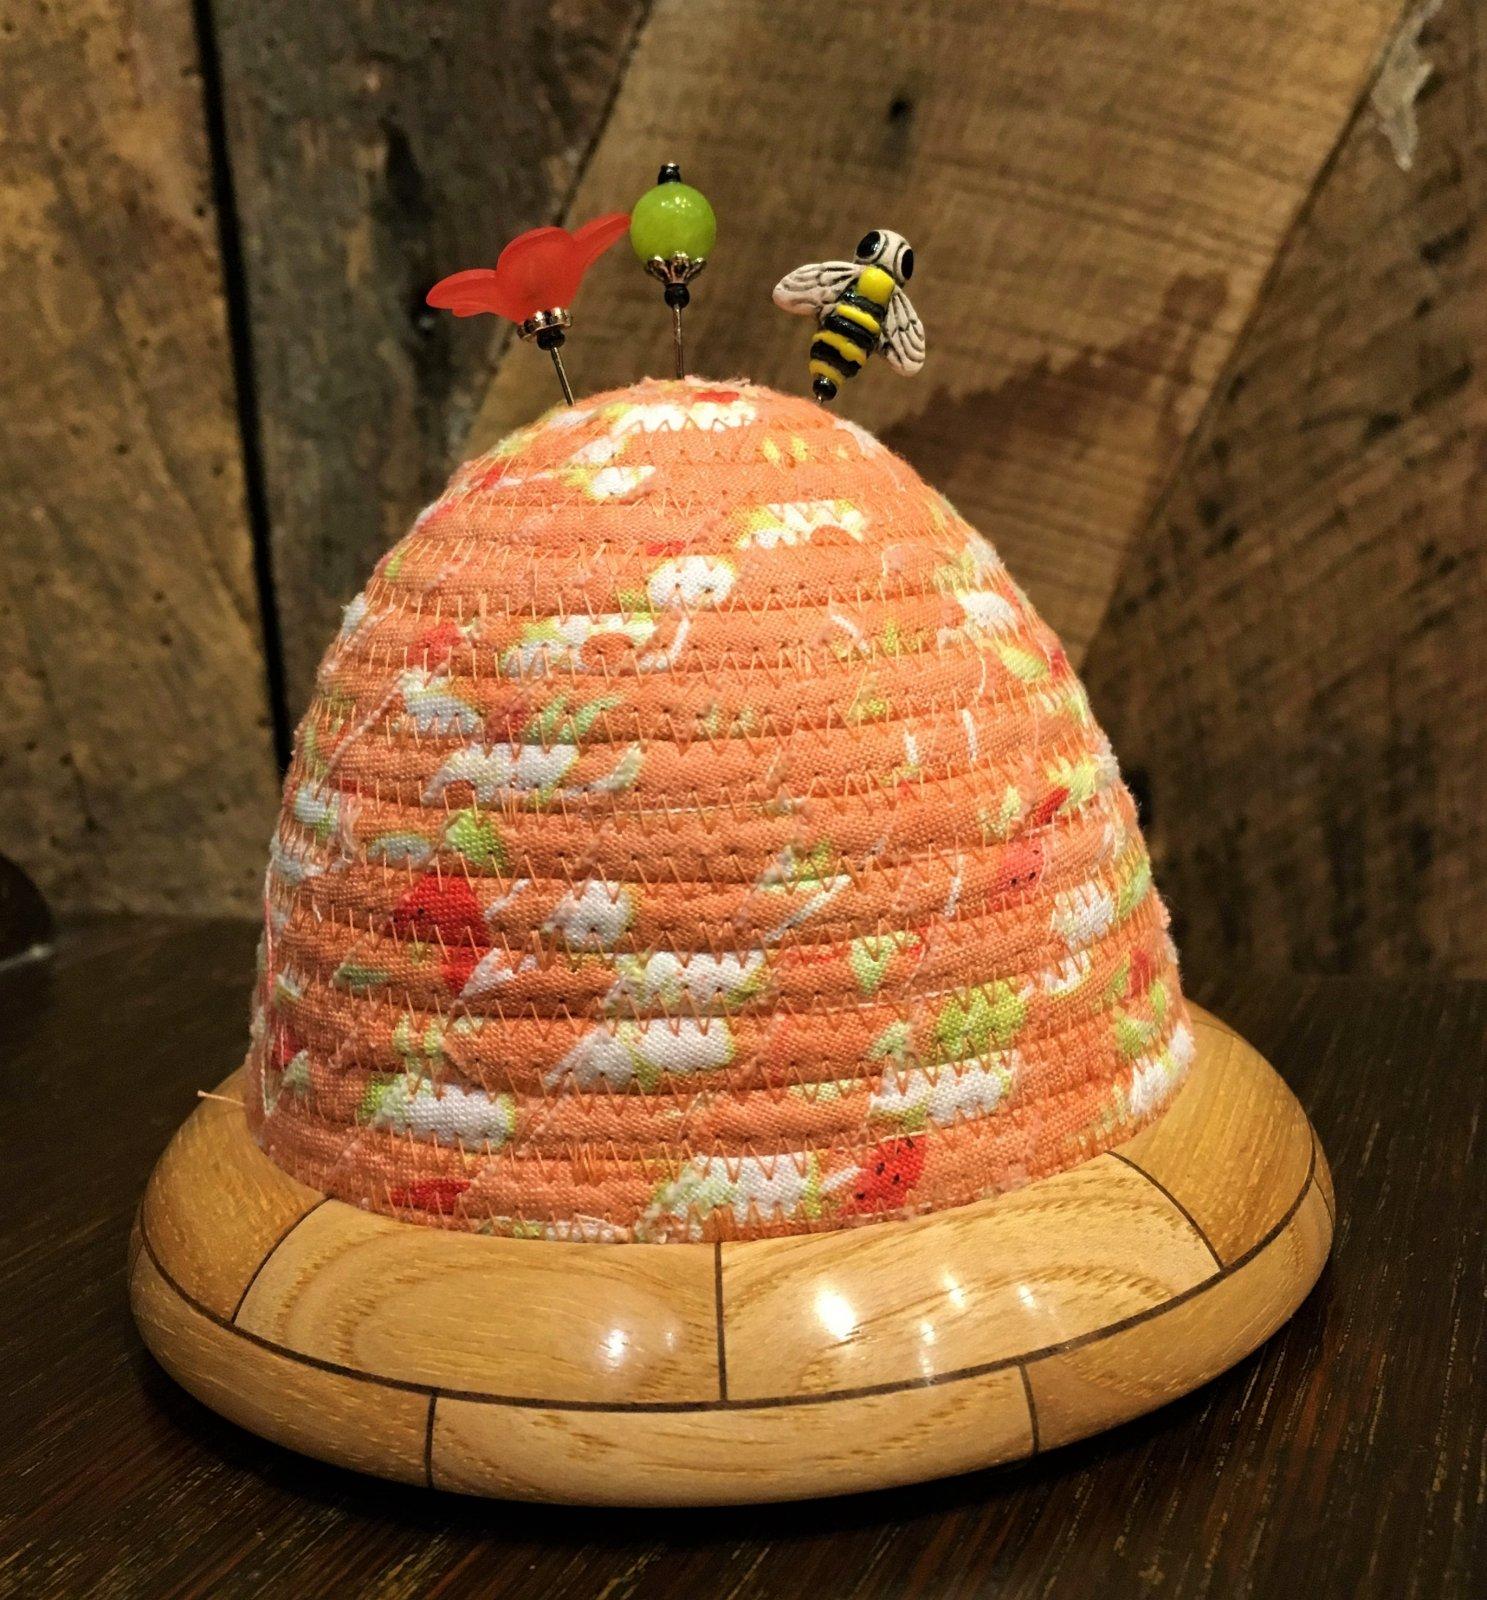 Beehive Pincushions - Chantilly Melon Top - Hickory / Walnut Base